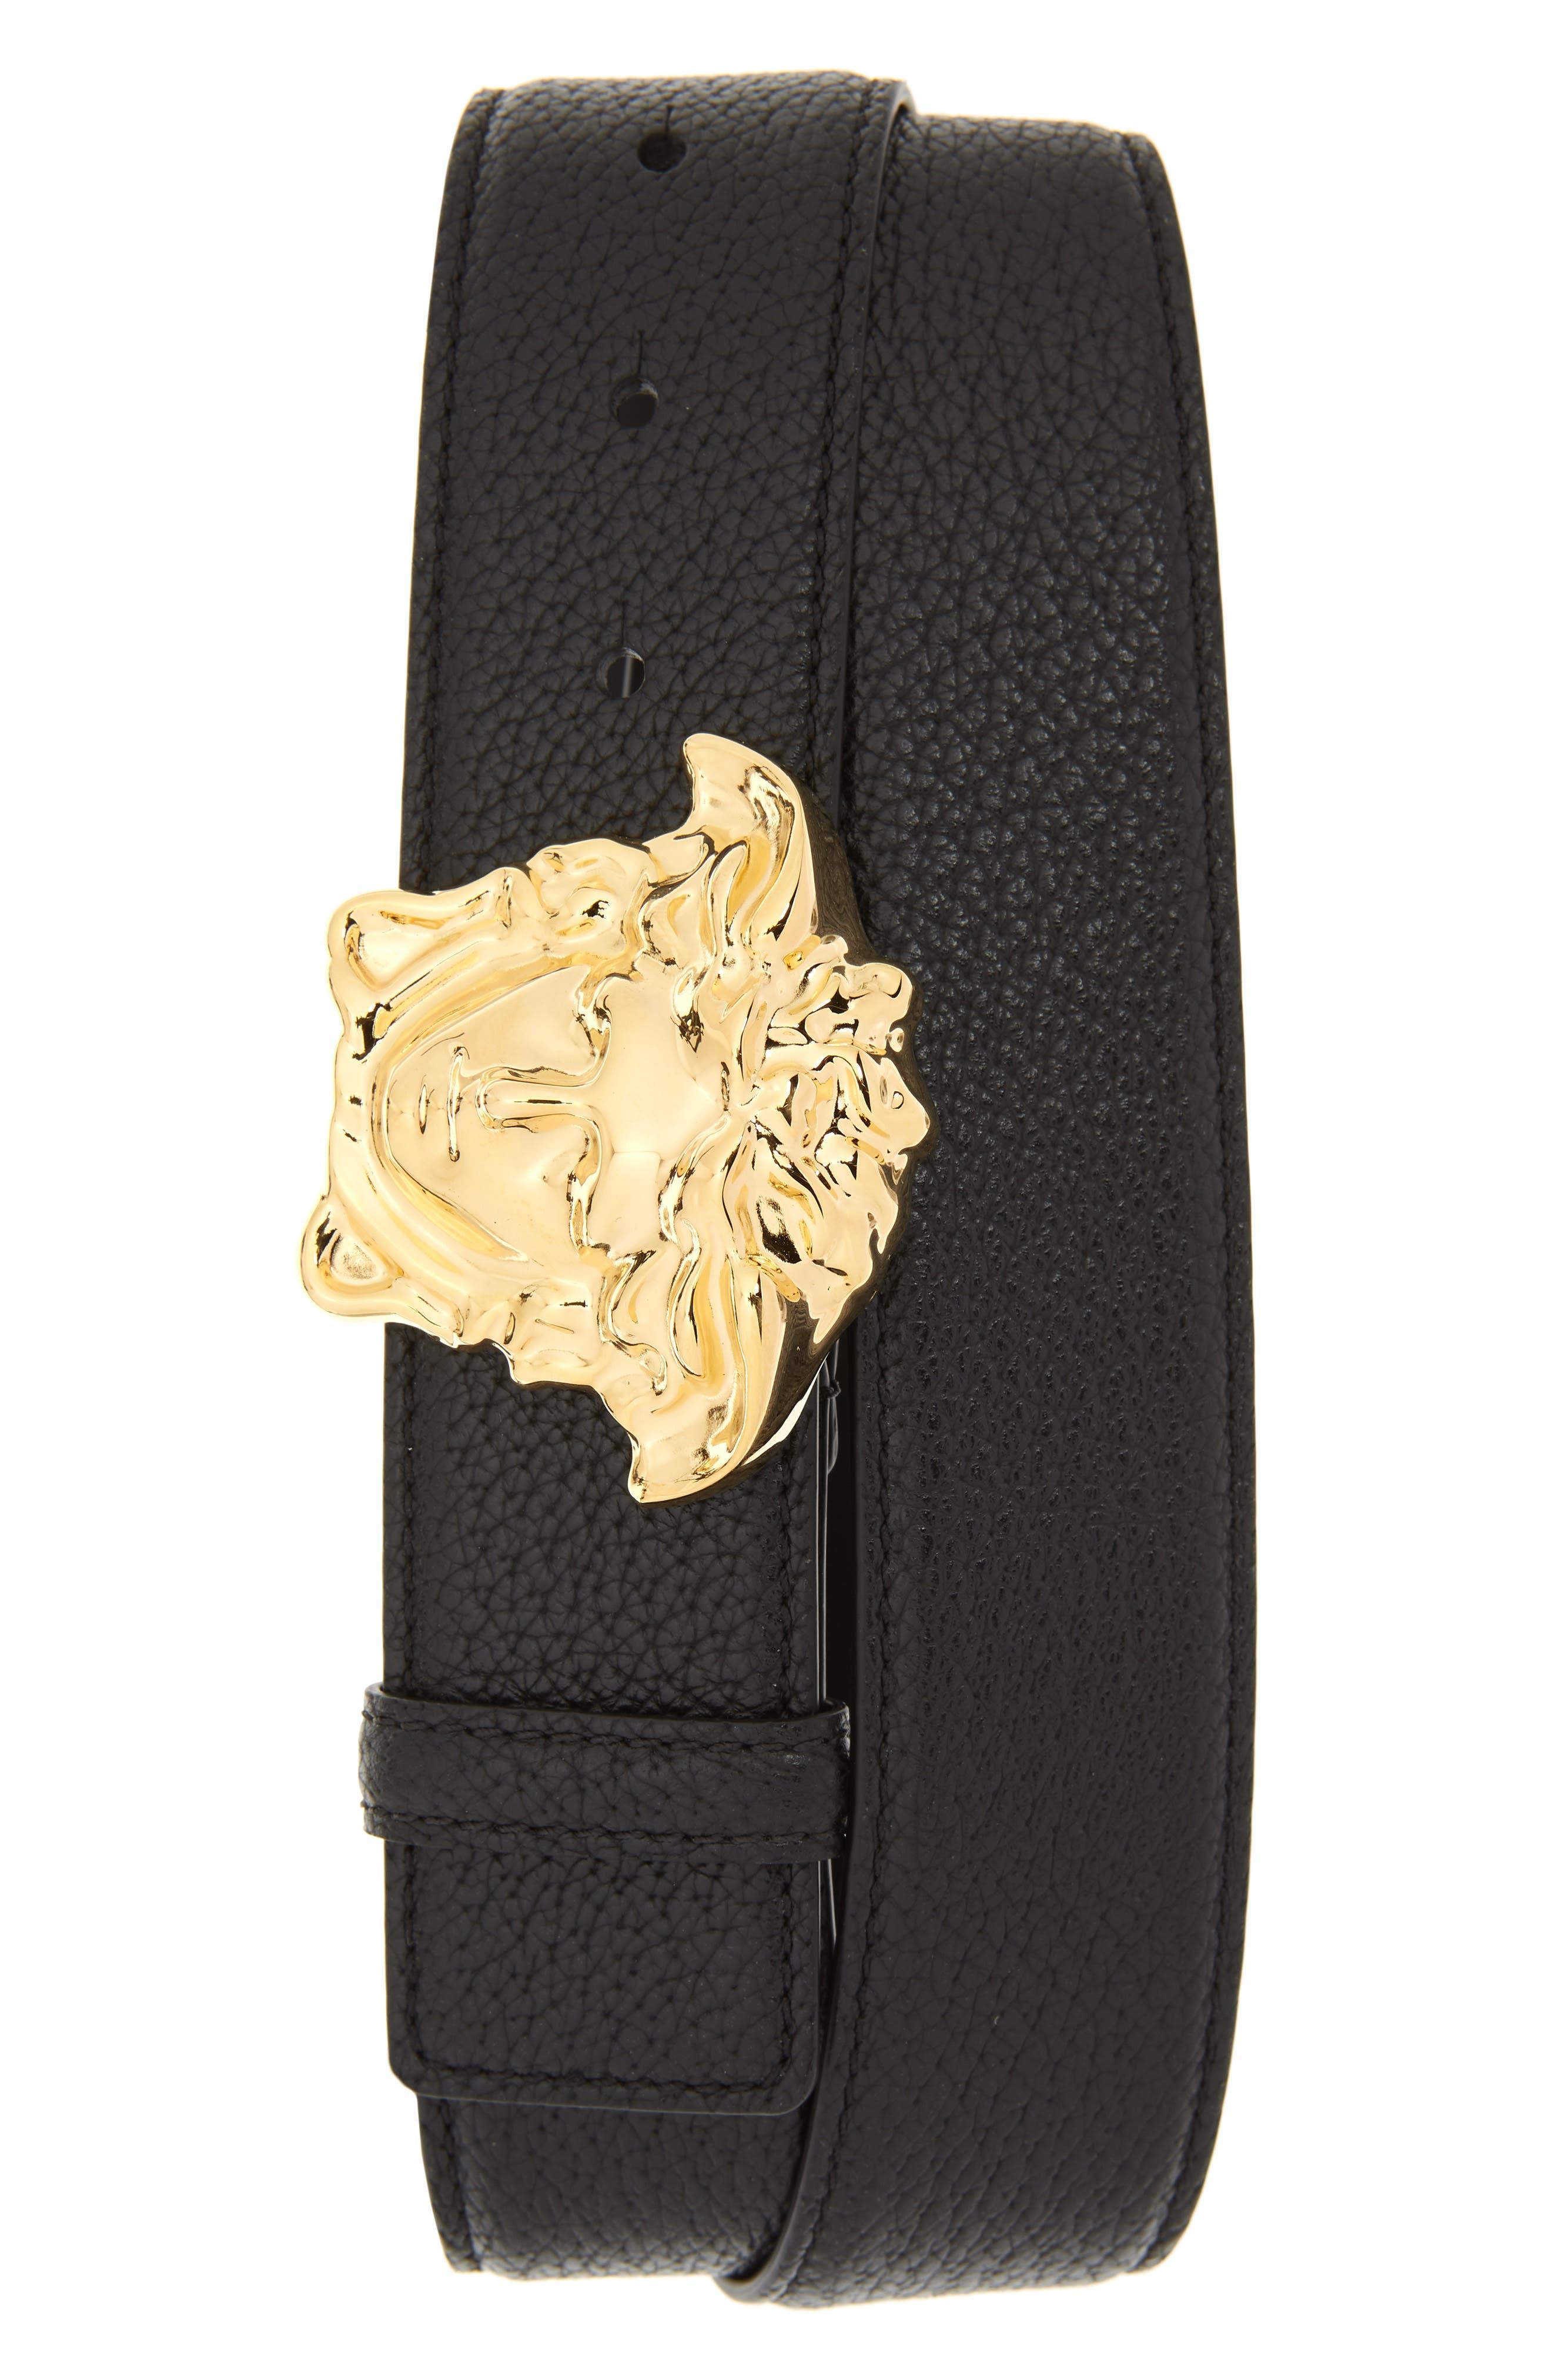 Medusa Buckle Leather Belt,                             Main thumbnail 1, color,                             BLACK WARM GOLD